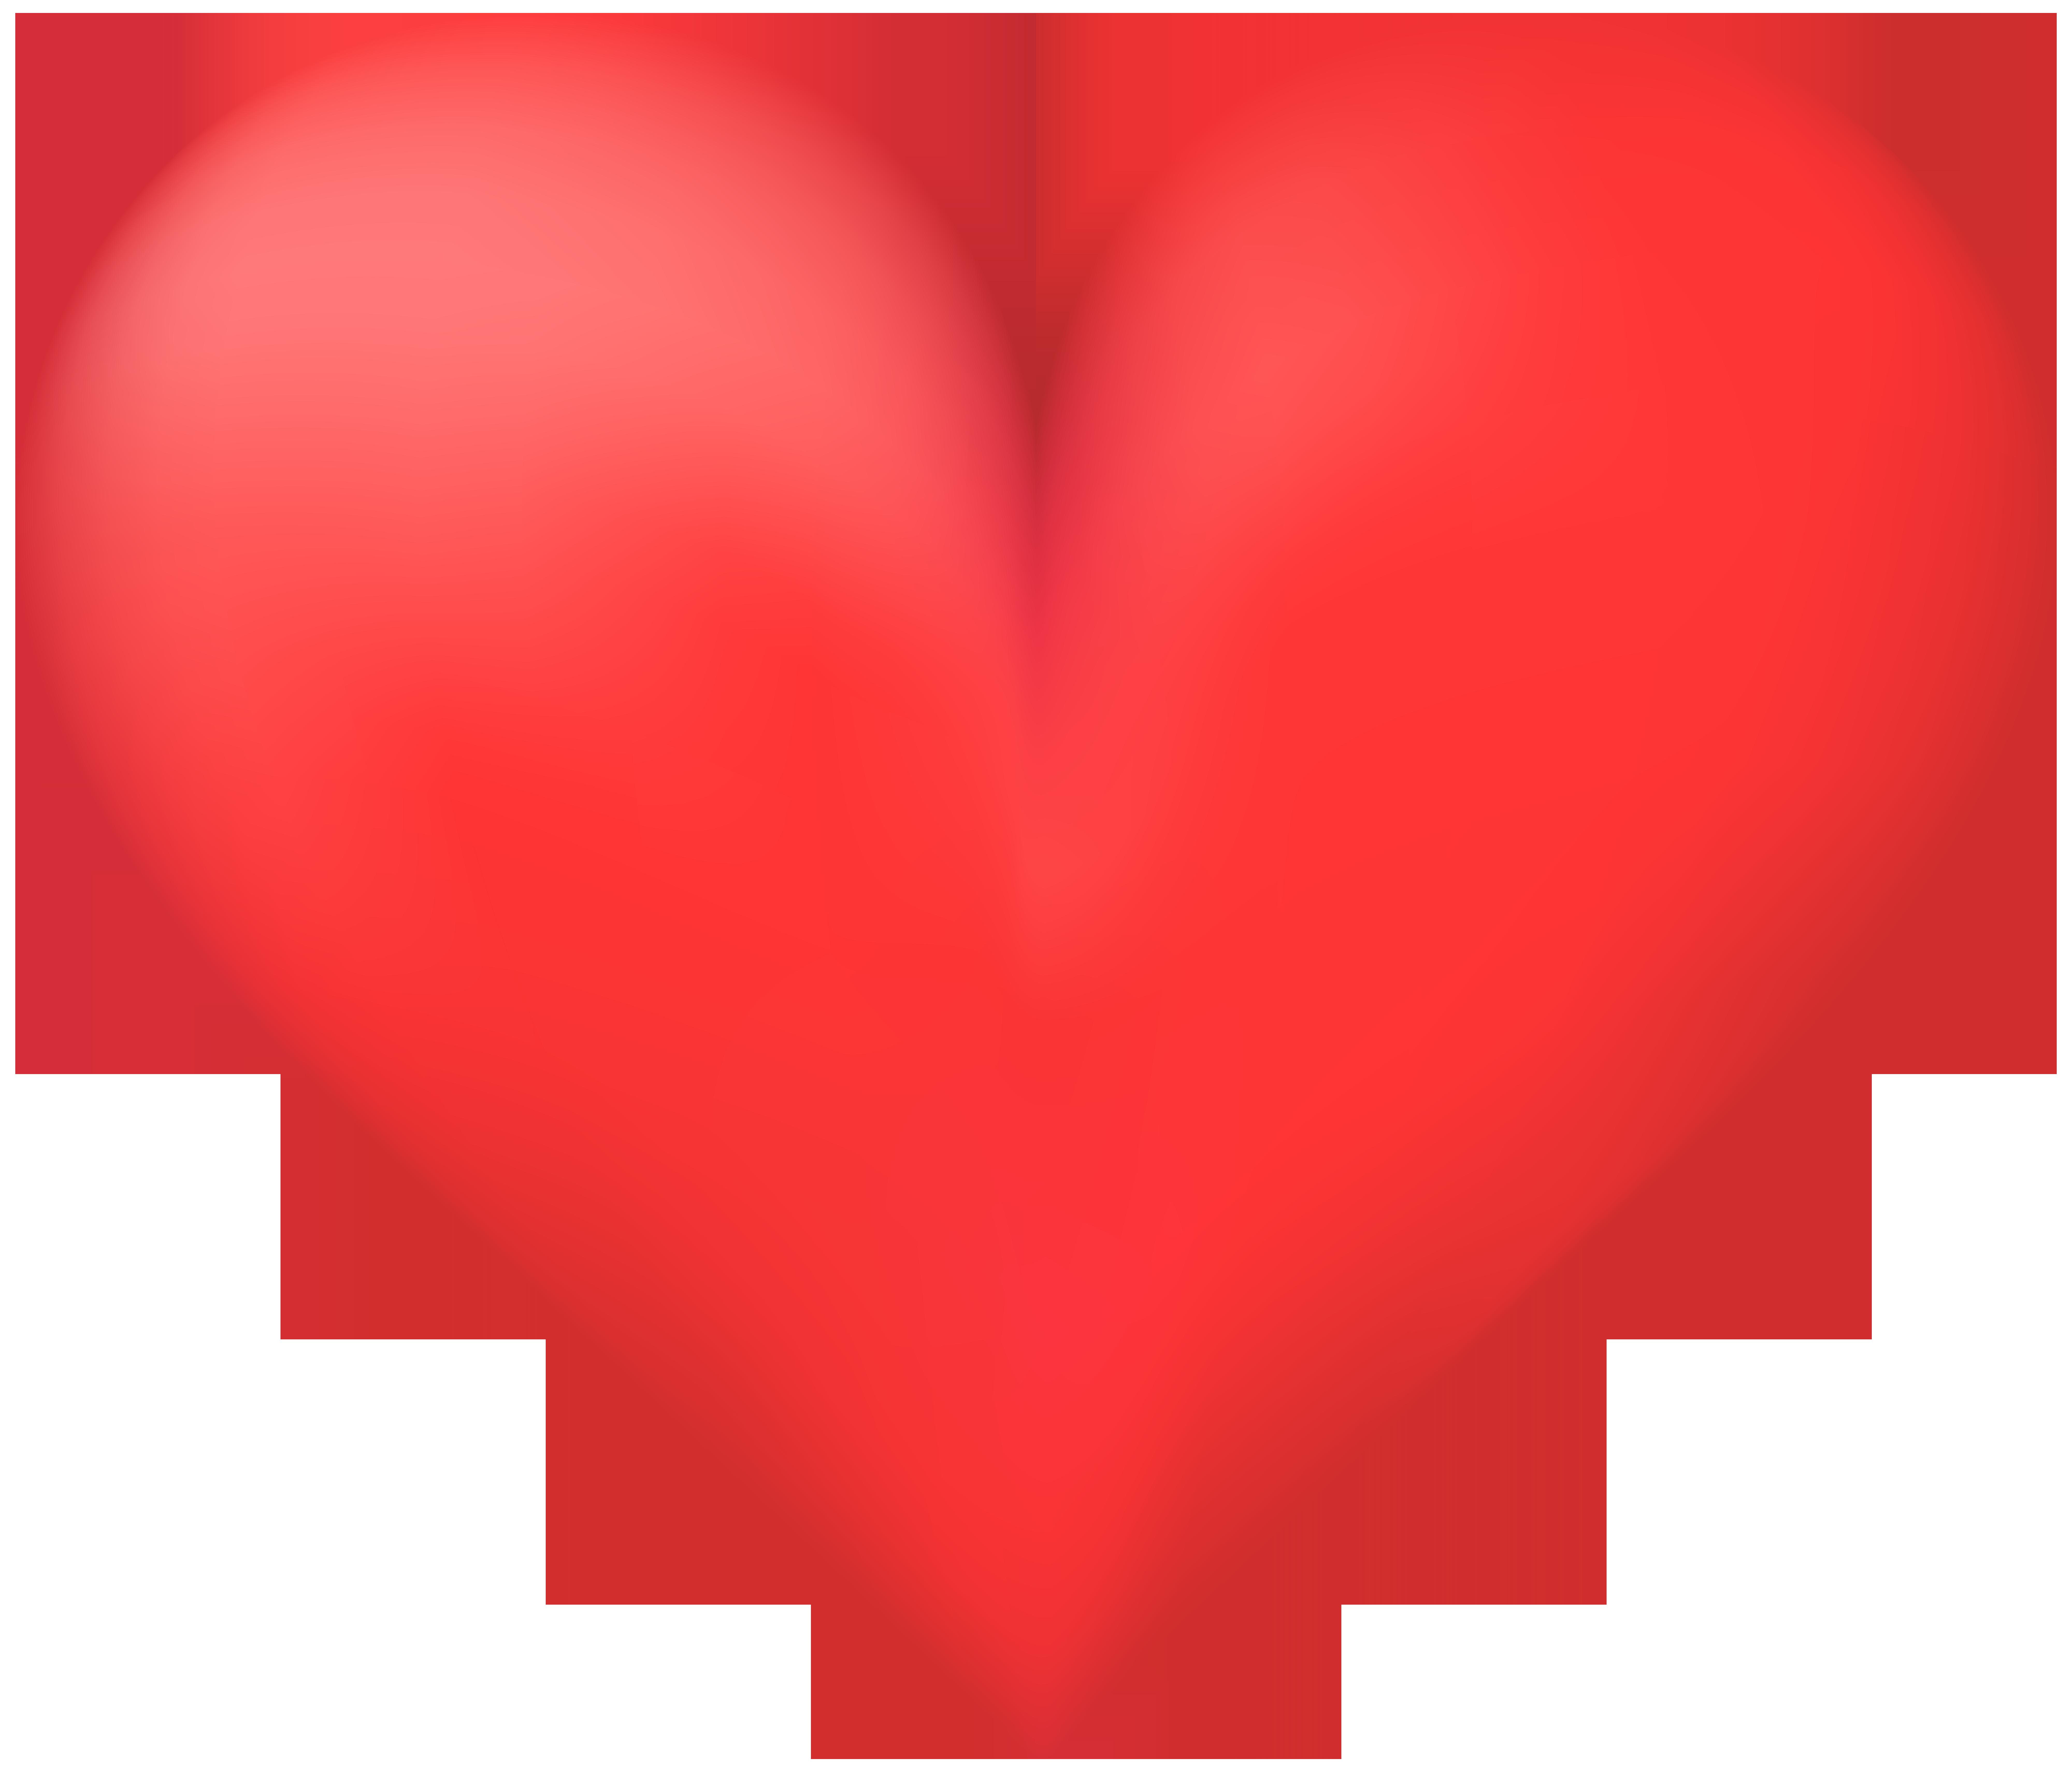 Heart clip art image. Love hearts png